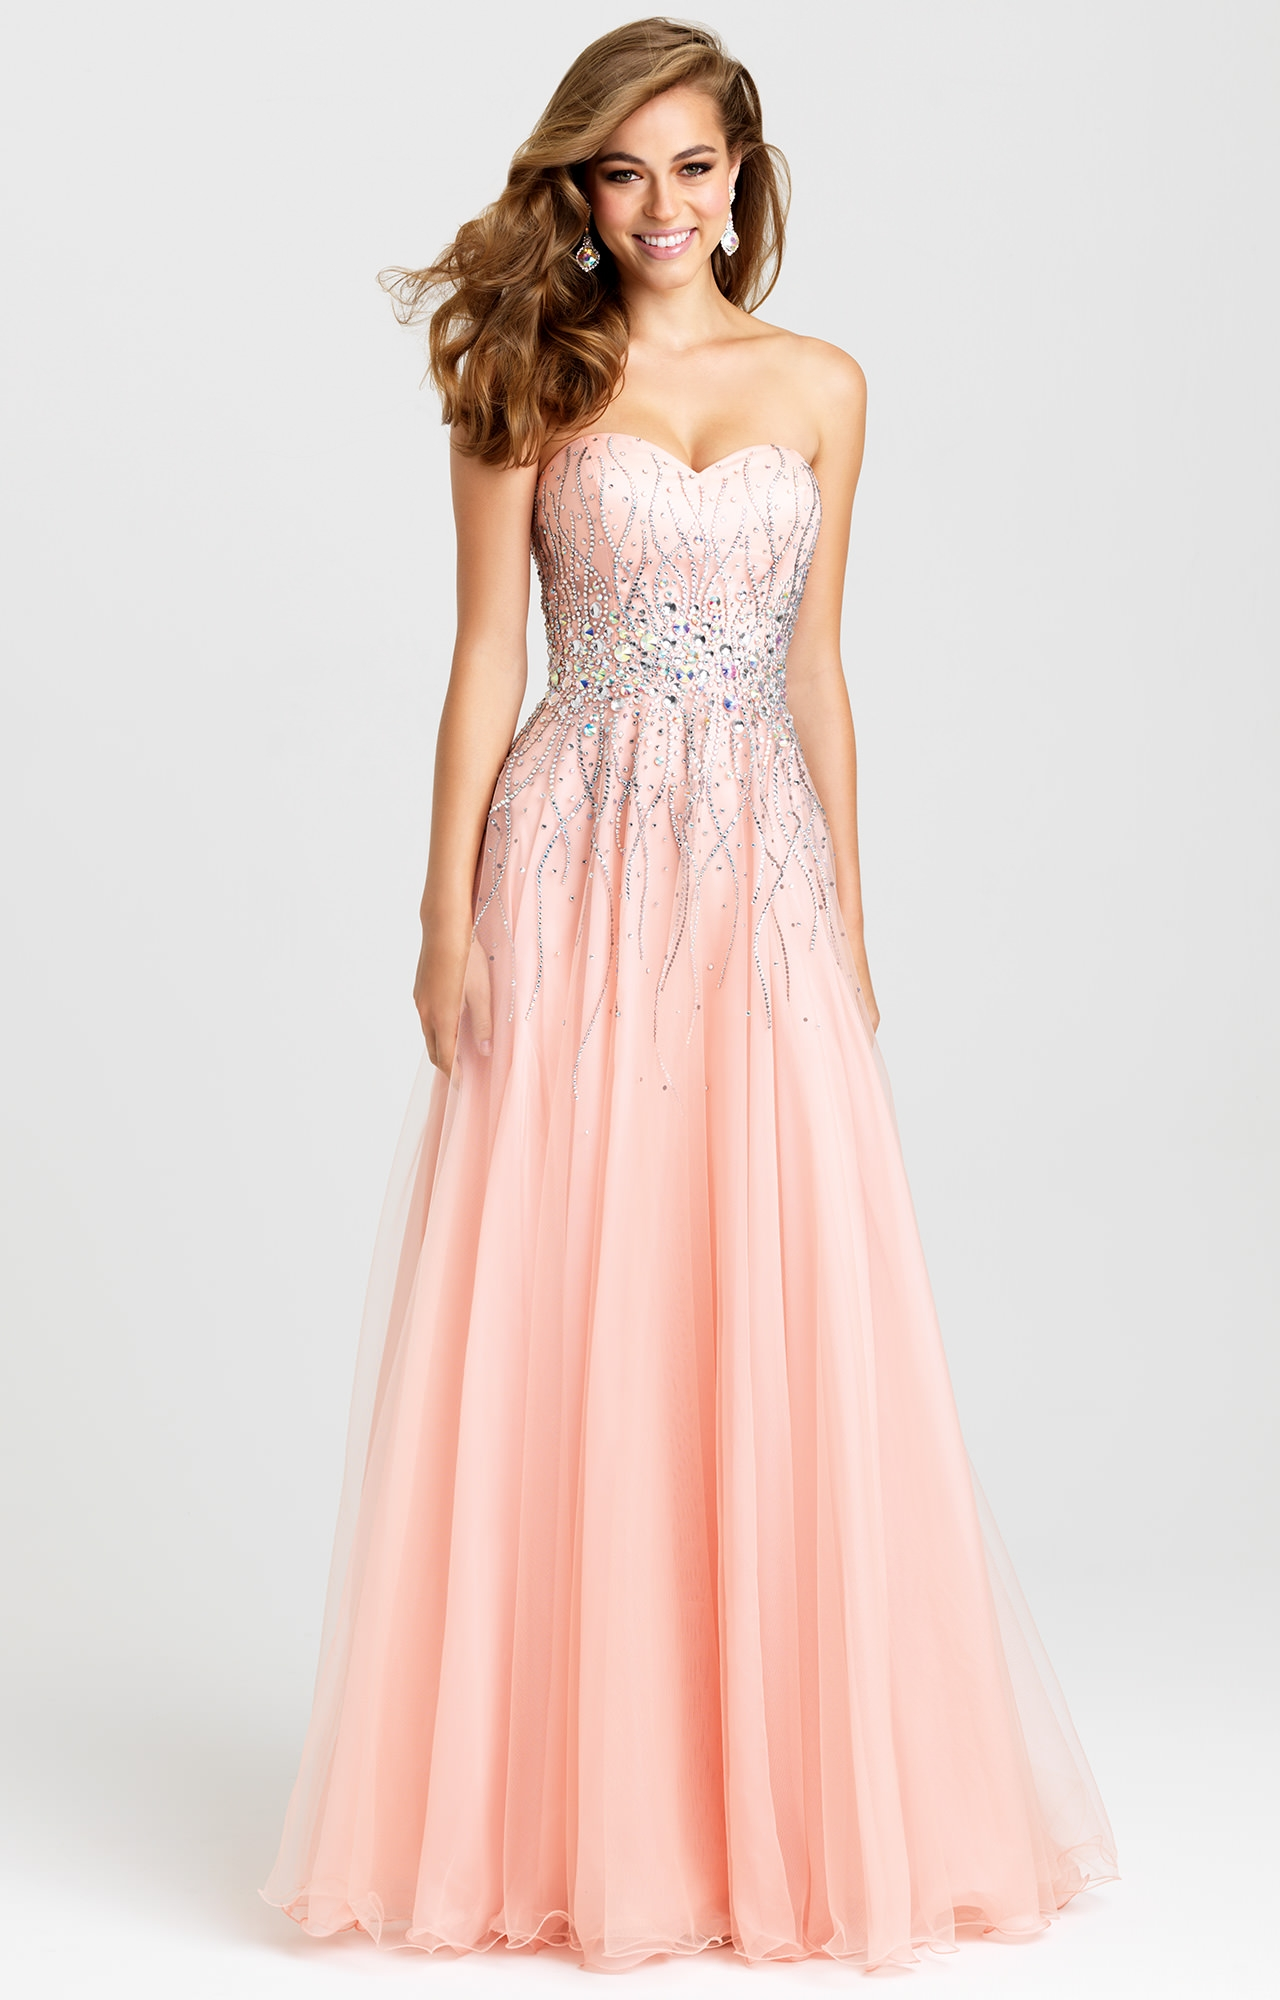 Madison James 16 369 Whimsical Fairy Dress Prom Dress